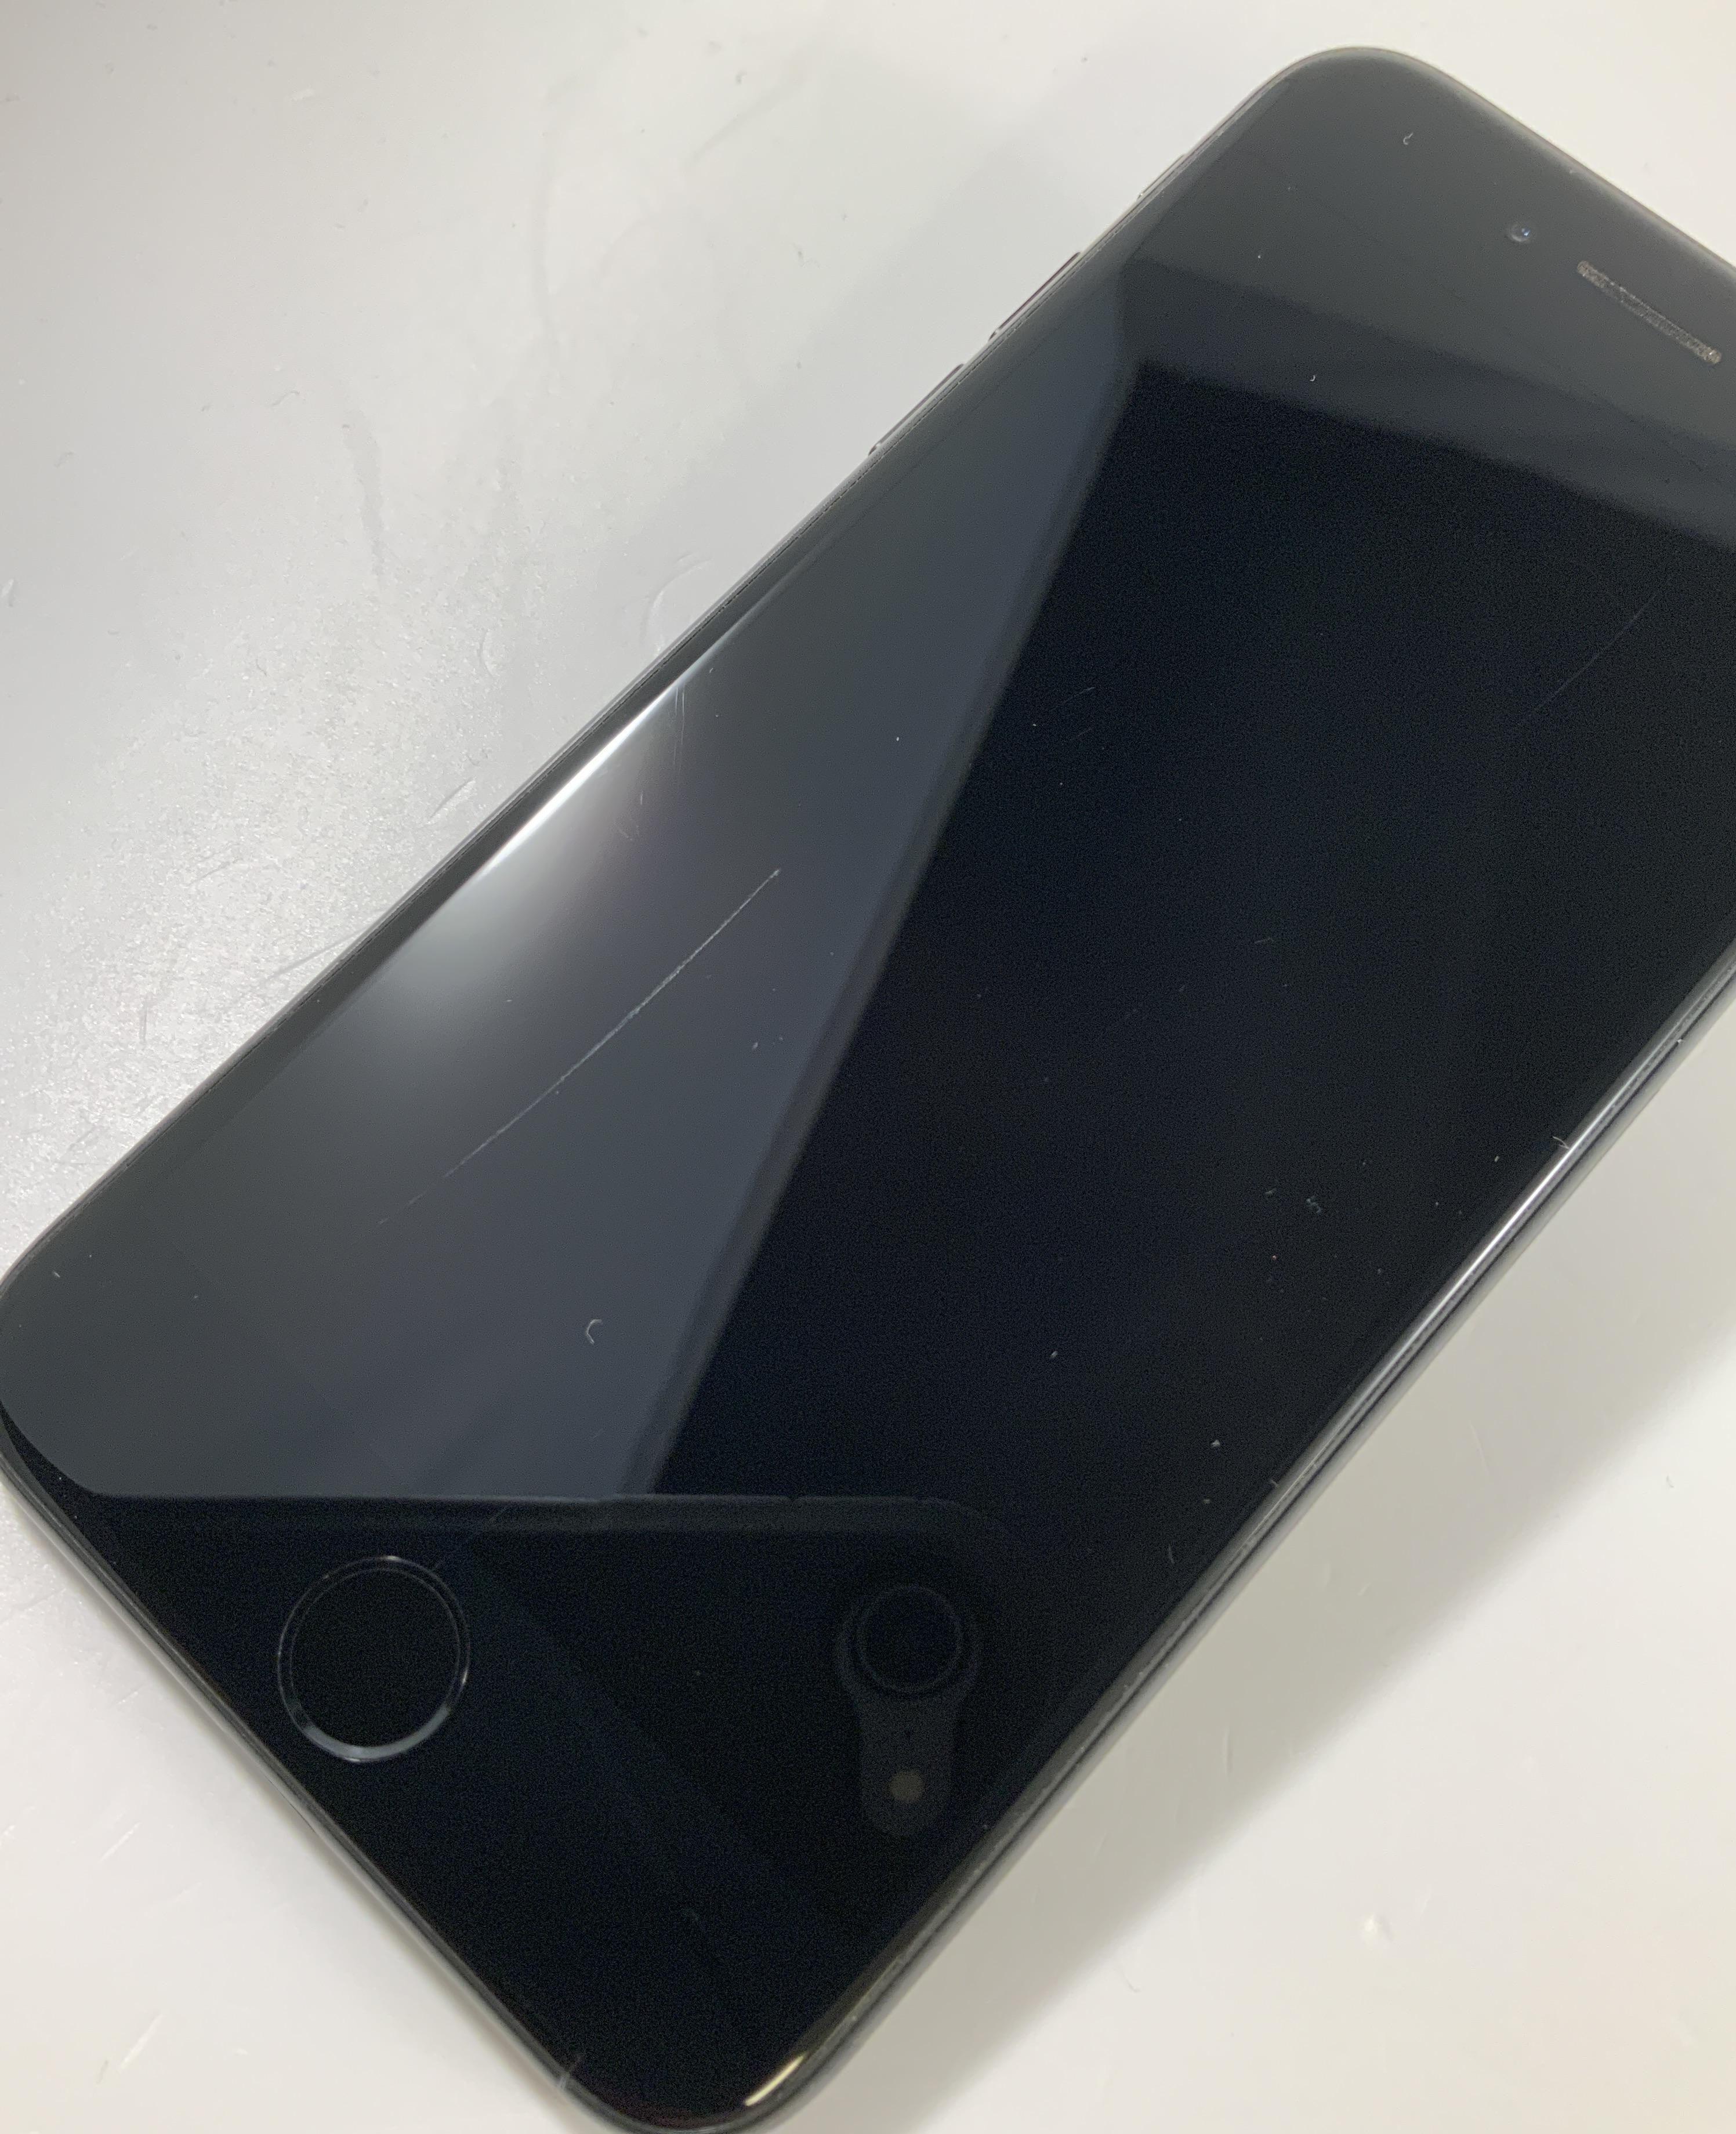 iPhone 7 32GB, 32GB, Black, immagine 3